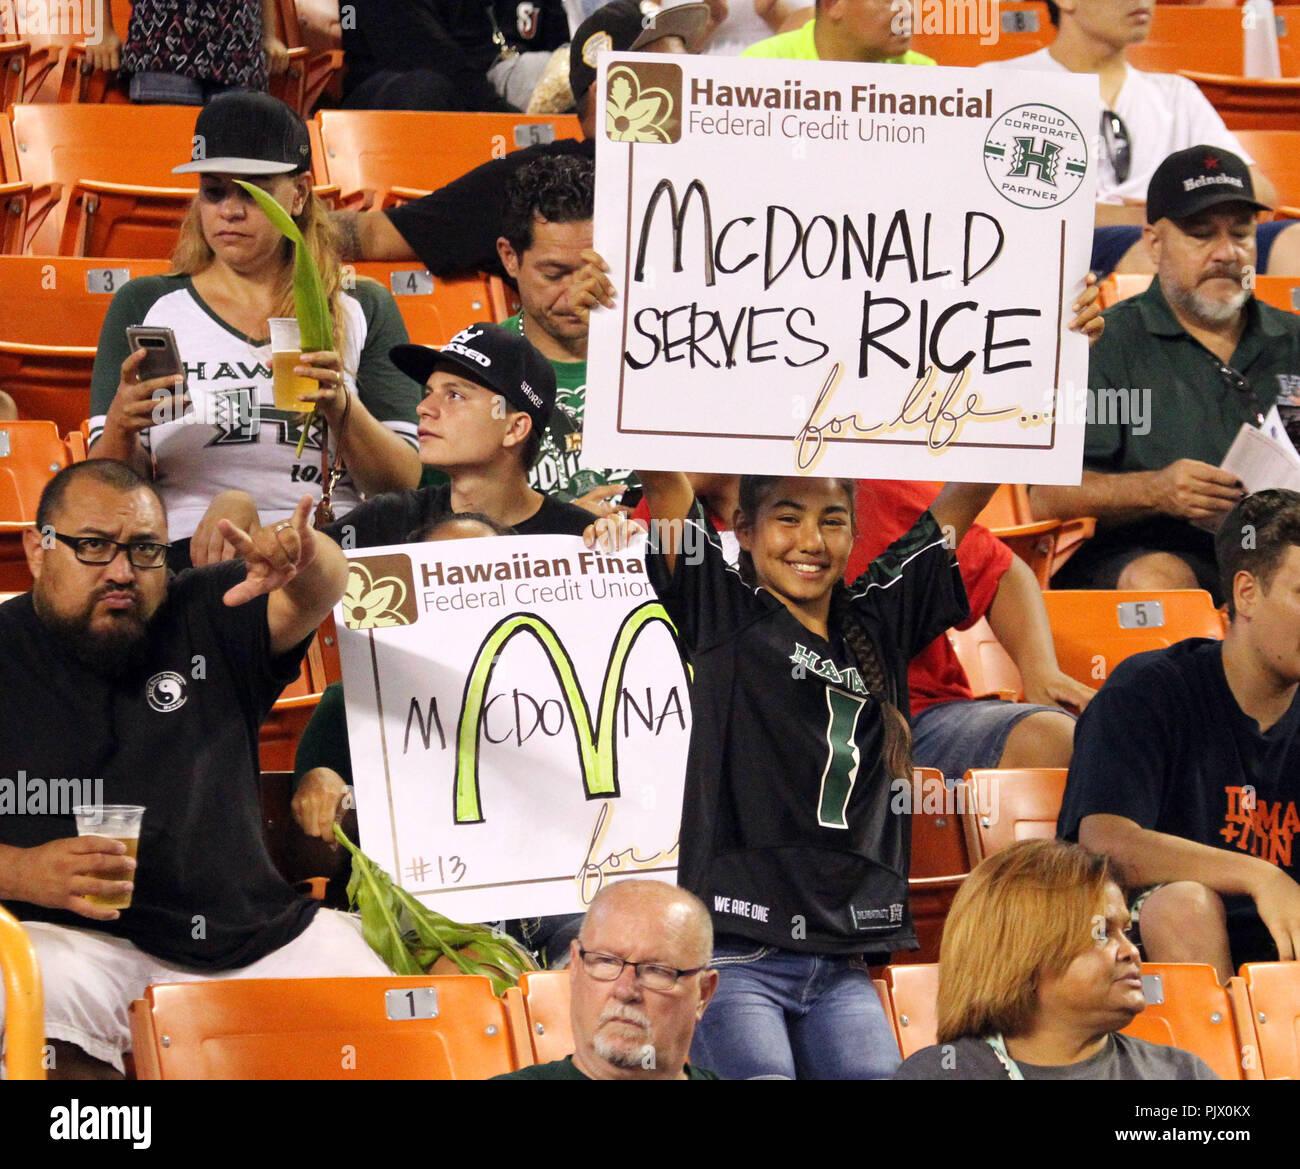 Honolulu, Hawaii. September 8, 2018 - Fans show a sense of humor during a game between the Hawaii Rainbow Warriors and the Rice Owls at Aloha Stadium in Honolulu, HI - Michael Sullivan/CSM Credit: Cal Sport Media/Alamy Live News Stock Photo